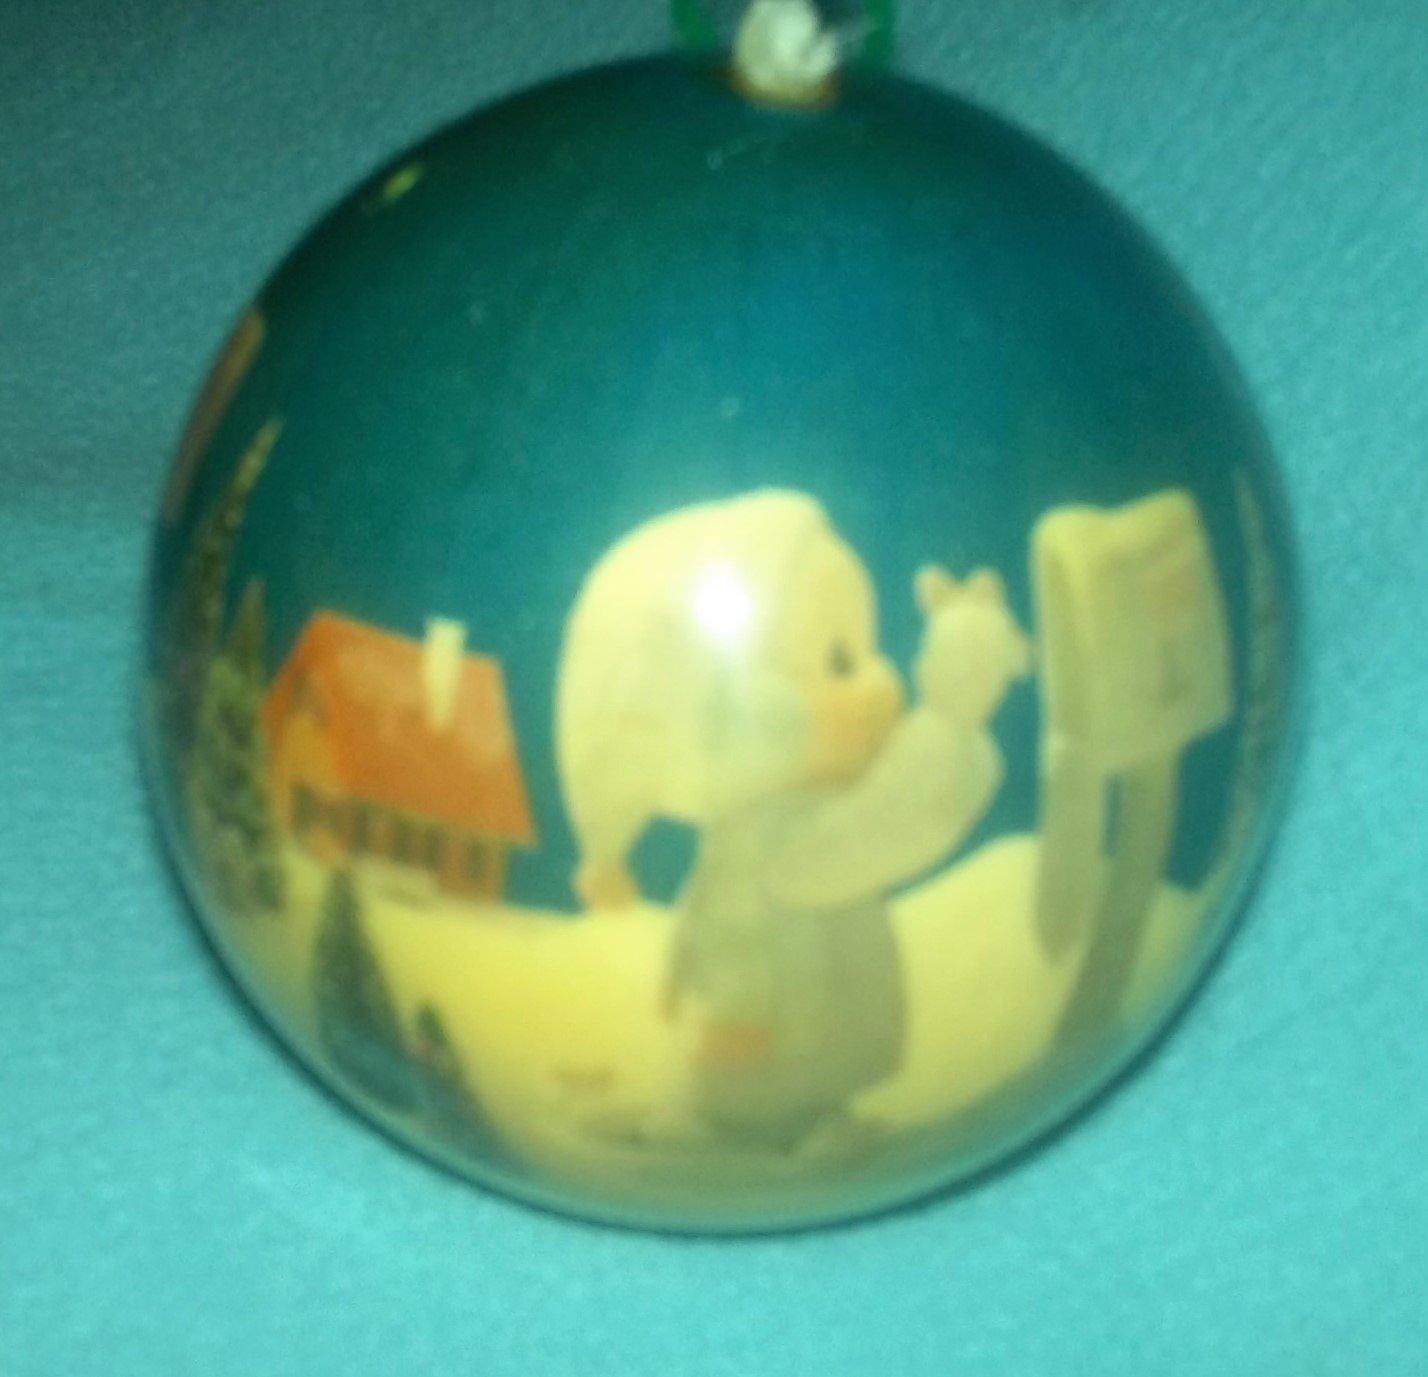 Enesco PRECIOUS MOMENTS 1991 Vintage Plastic Ornament Ball CHRISTMAS HOLIDAY